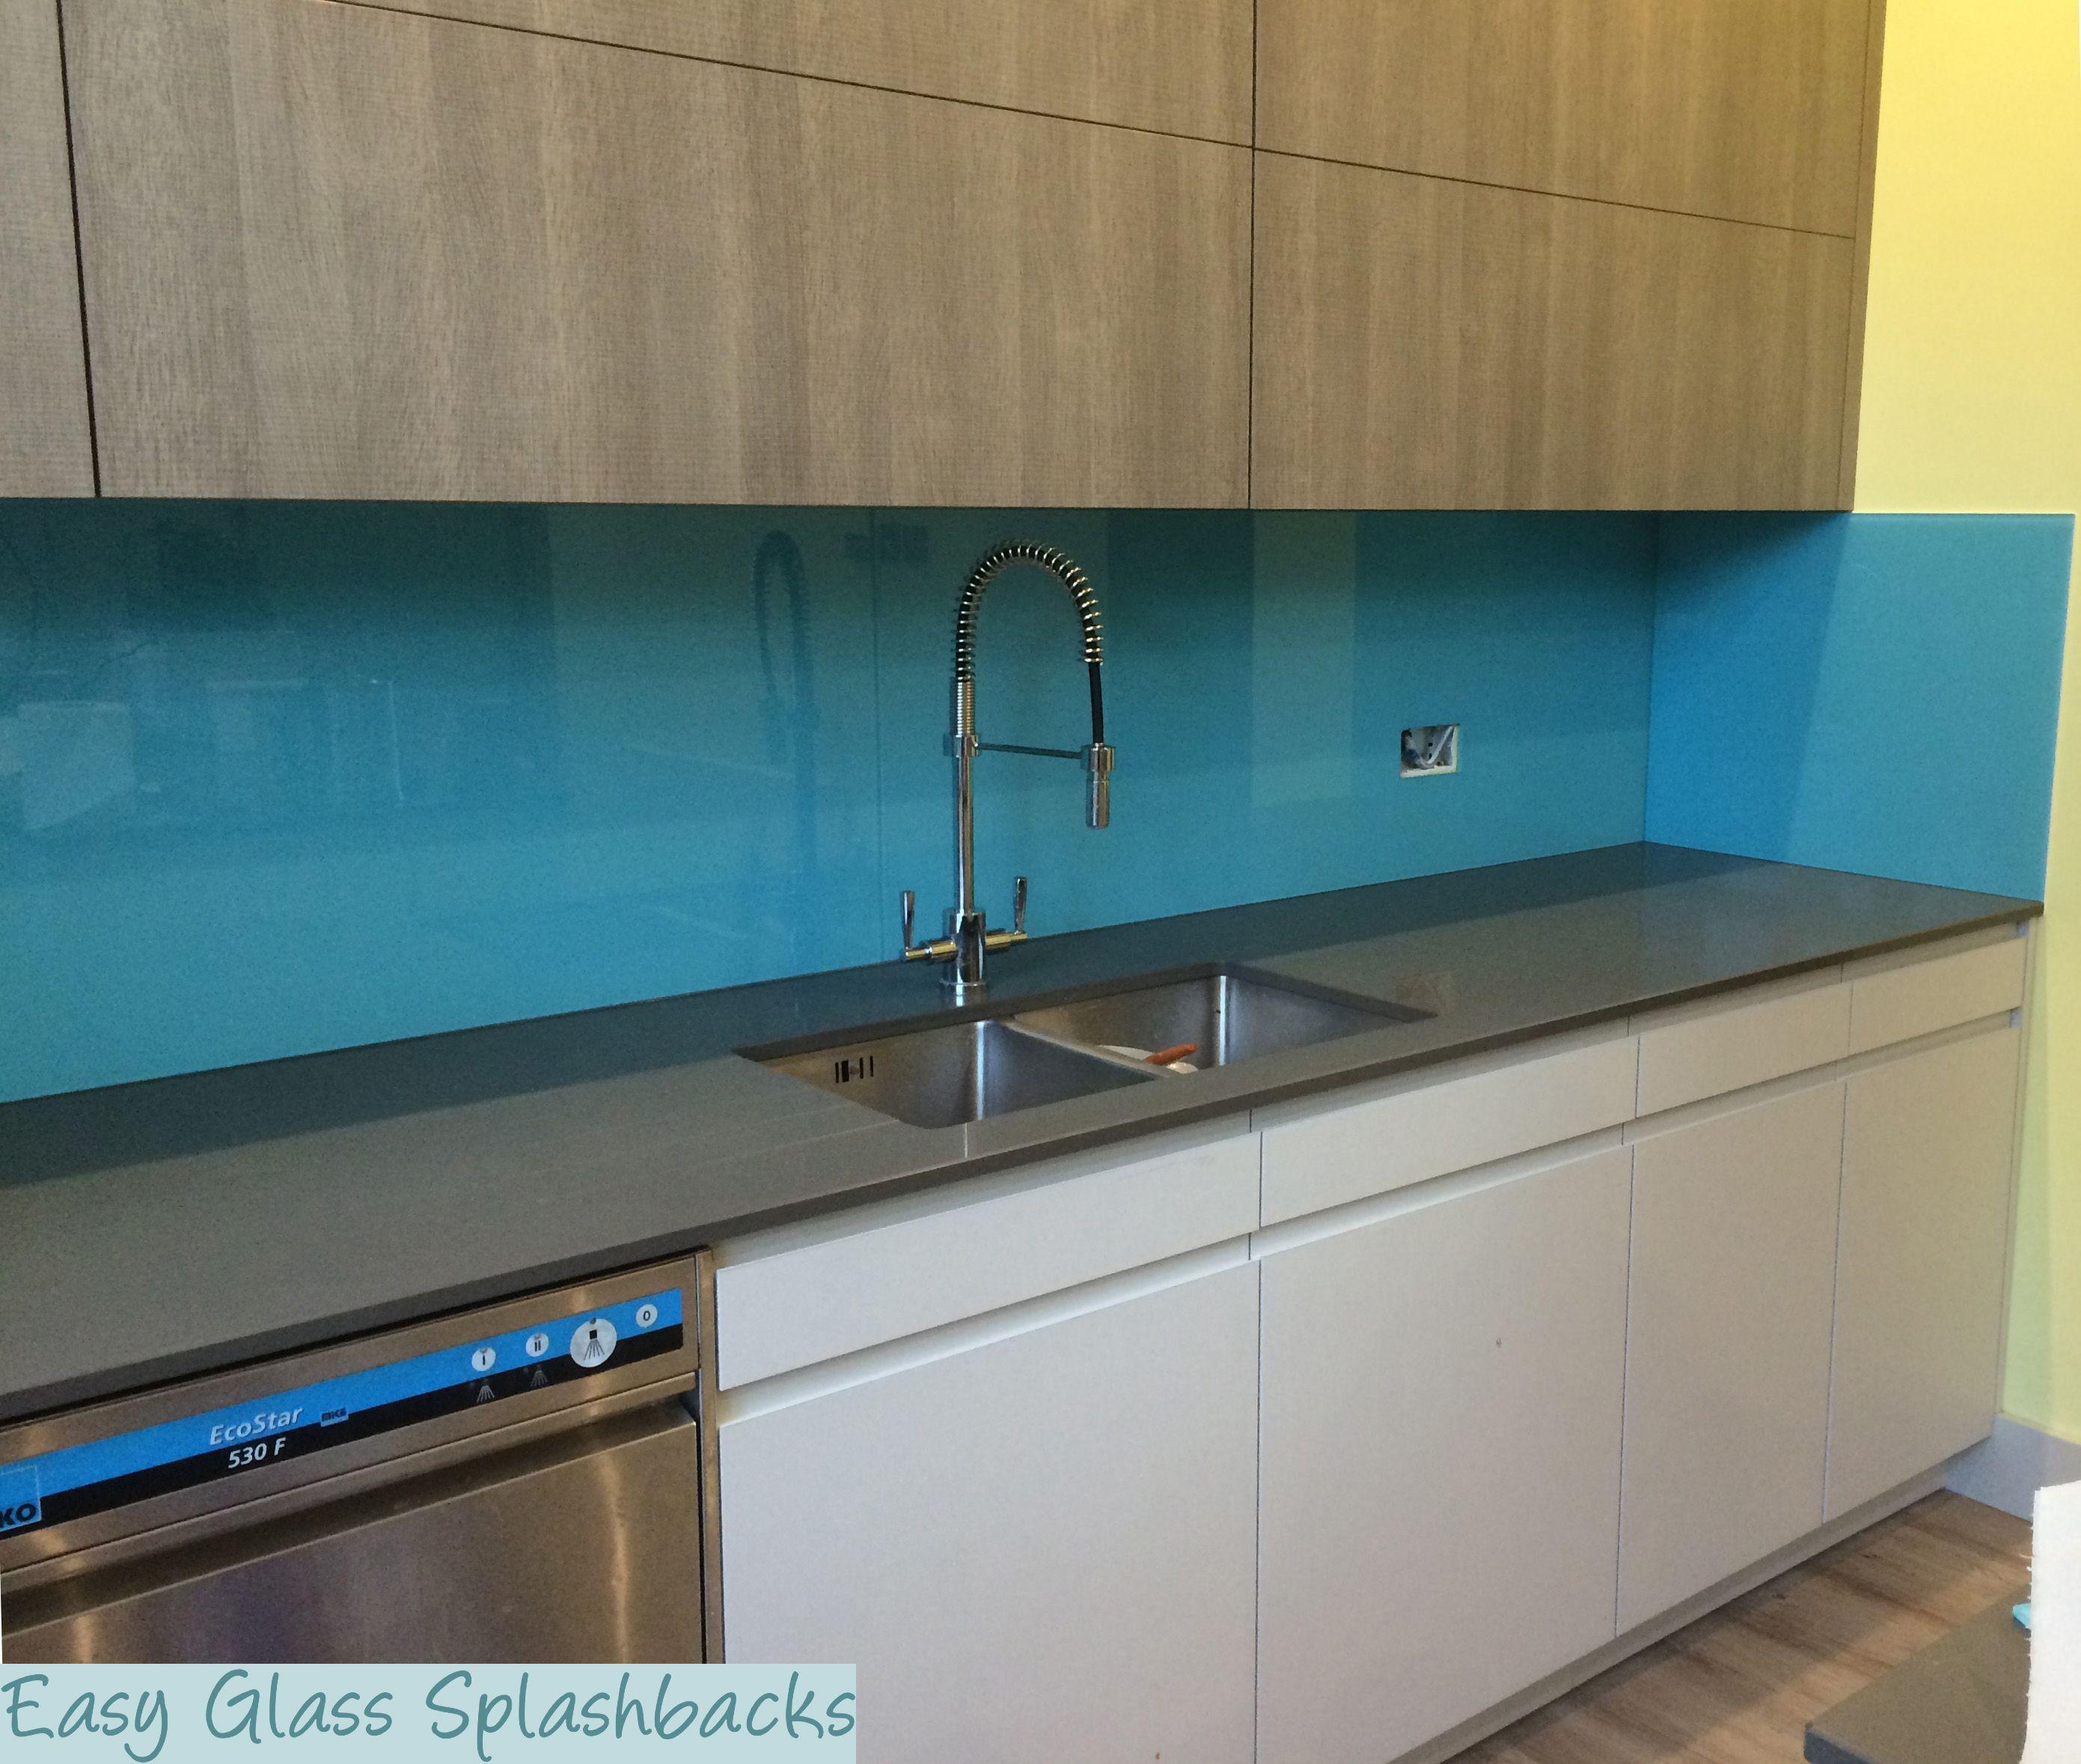 Light Sky Blue Coloured Glass Splashback In A White Kitchen With Black Worktop Visit Easyglasssplashbackscouk To Discover More